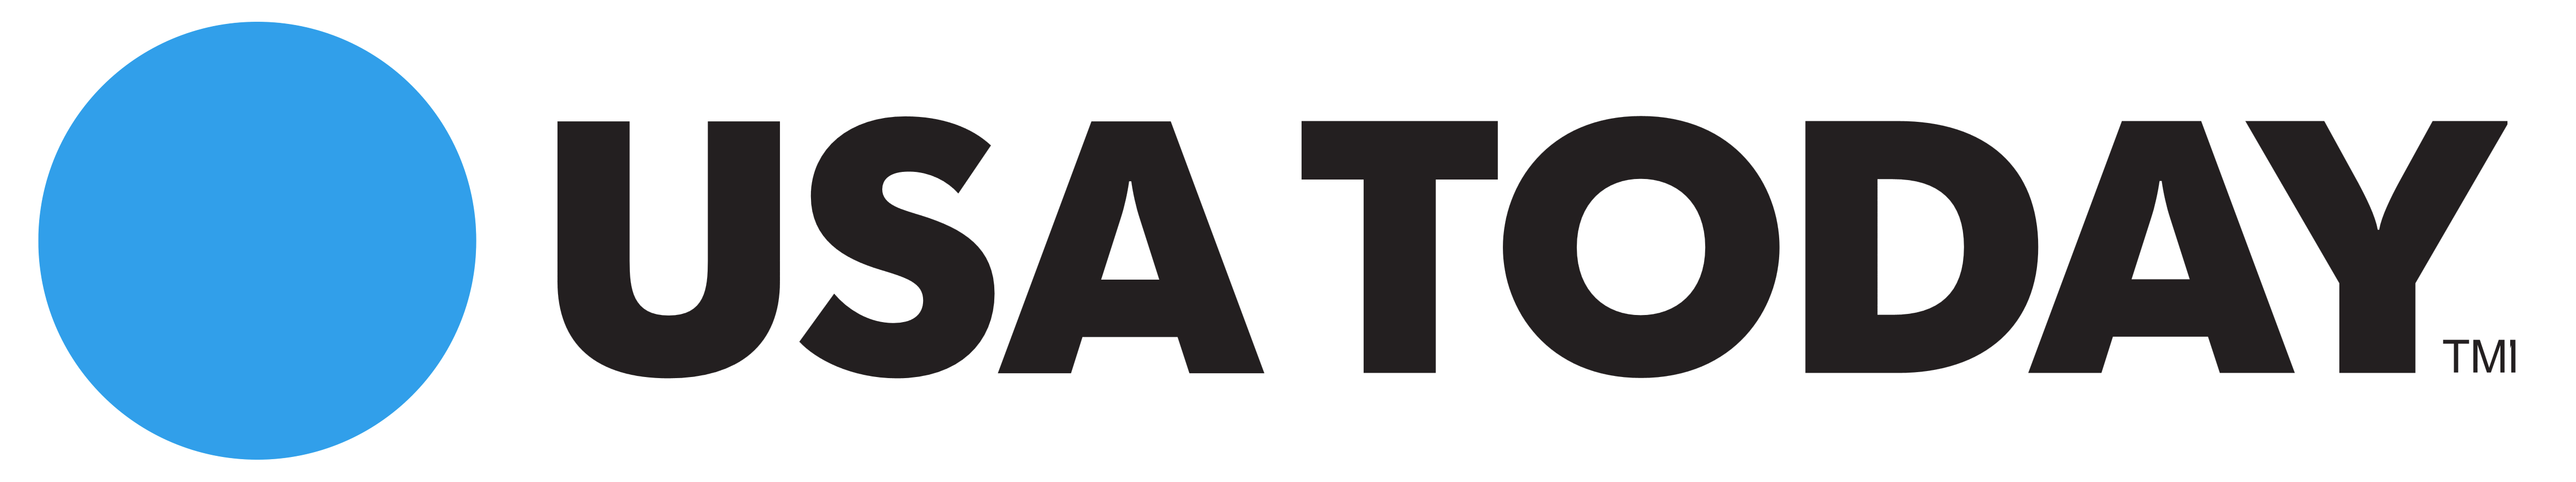 USA_Today_logo_horizontal